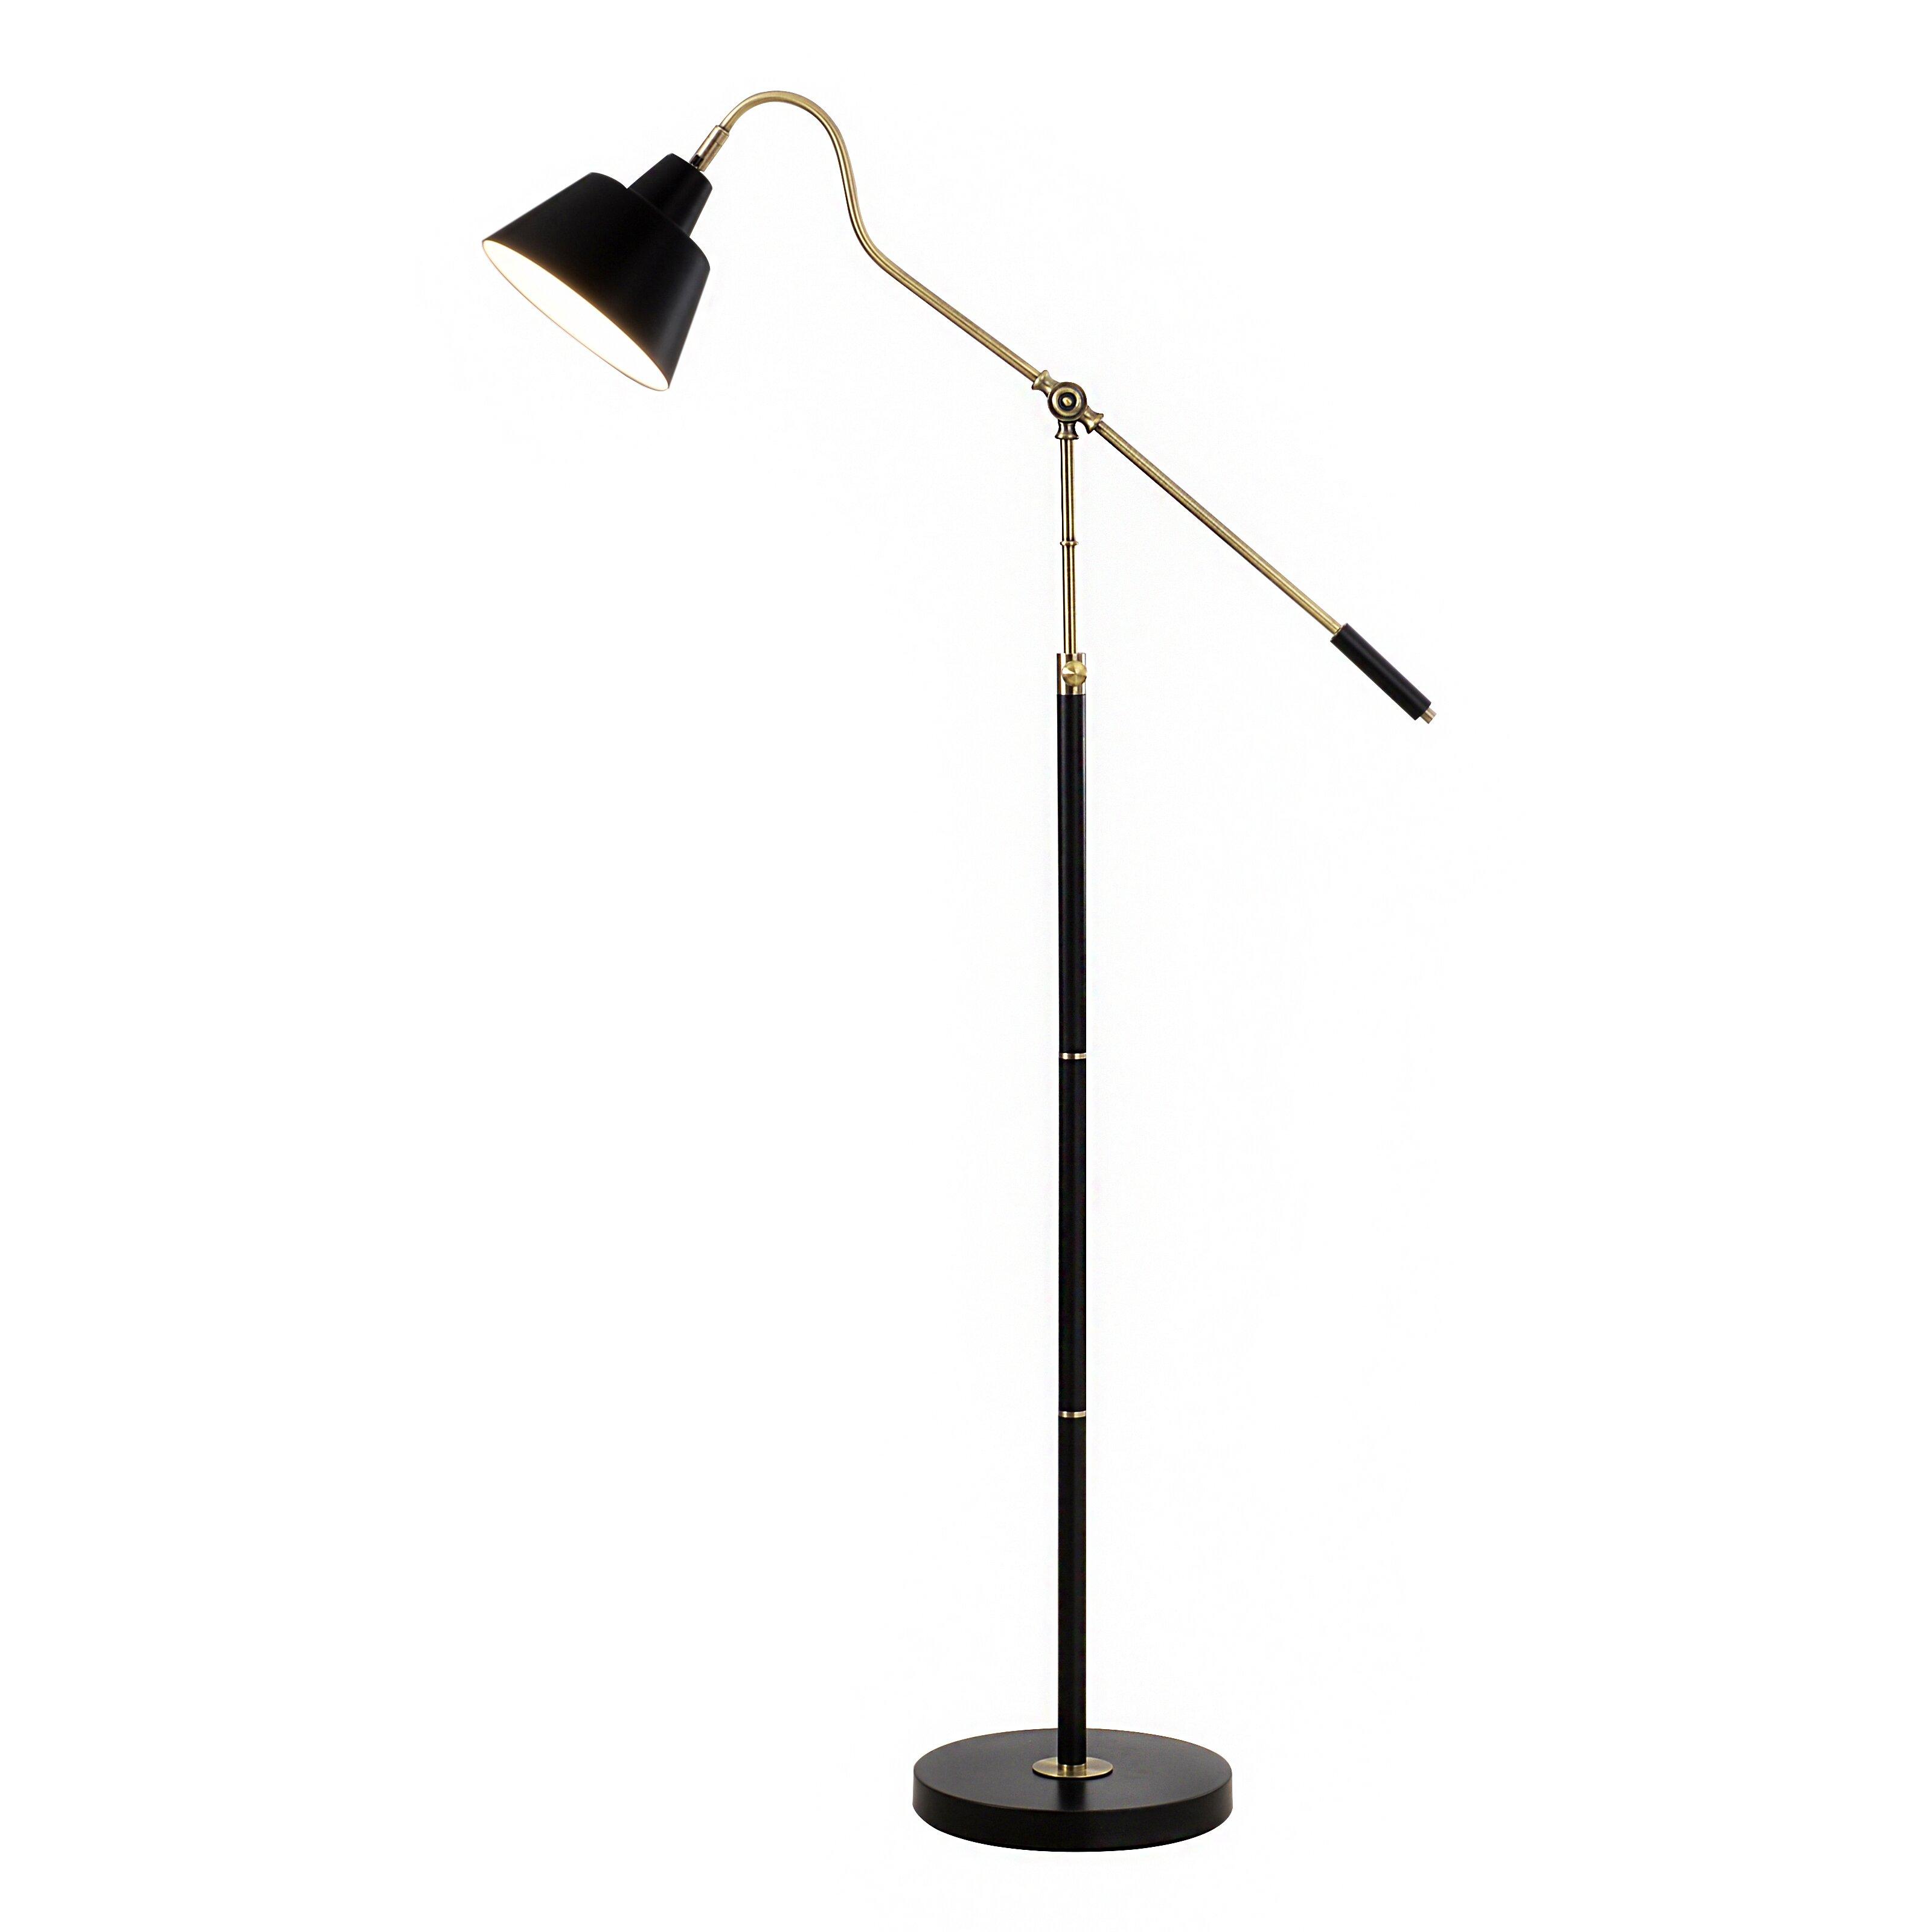 Catalina lighting task floor lamp reviews wayfair for Task lighting floor lamp